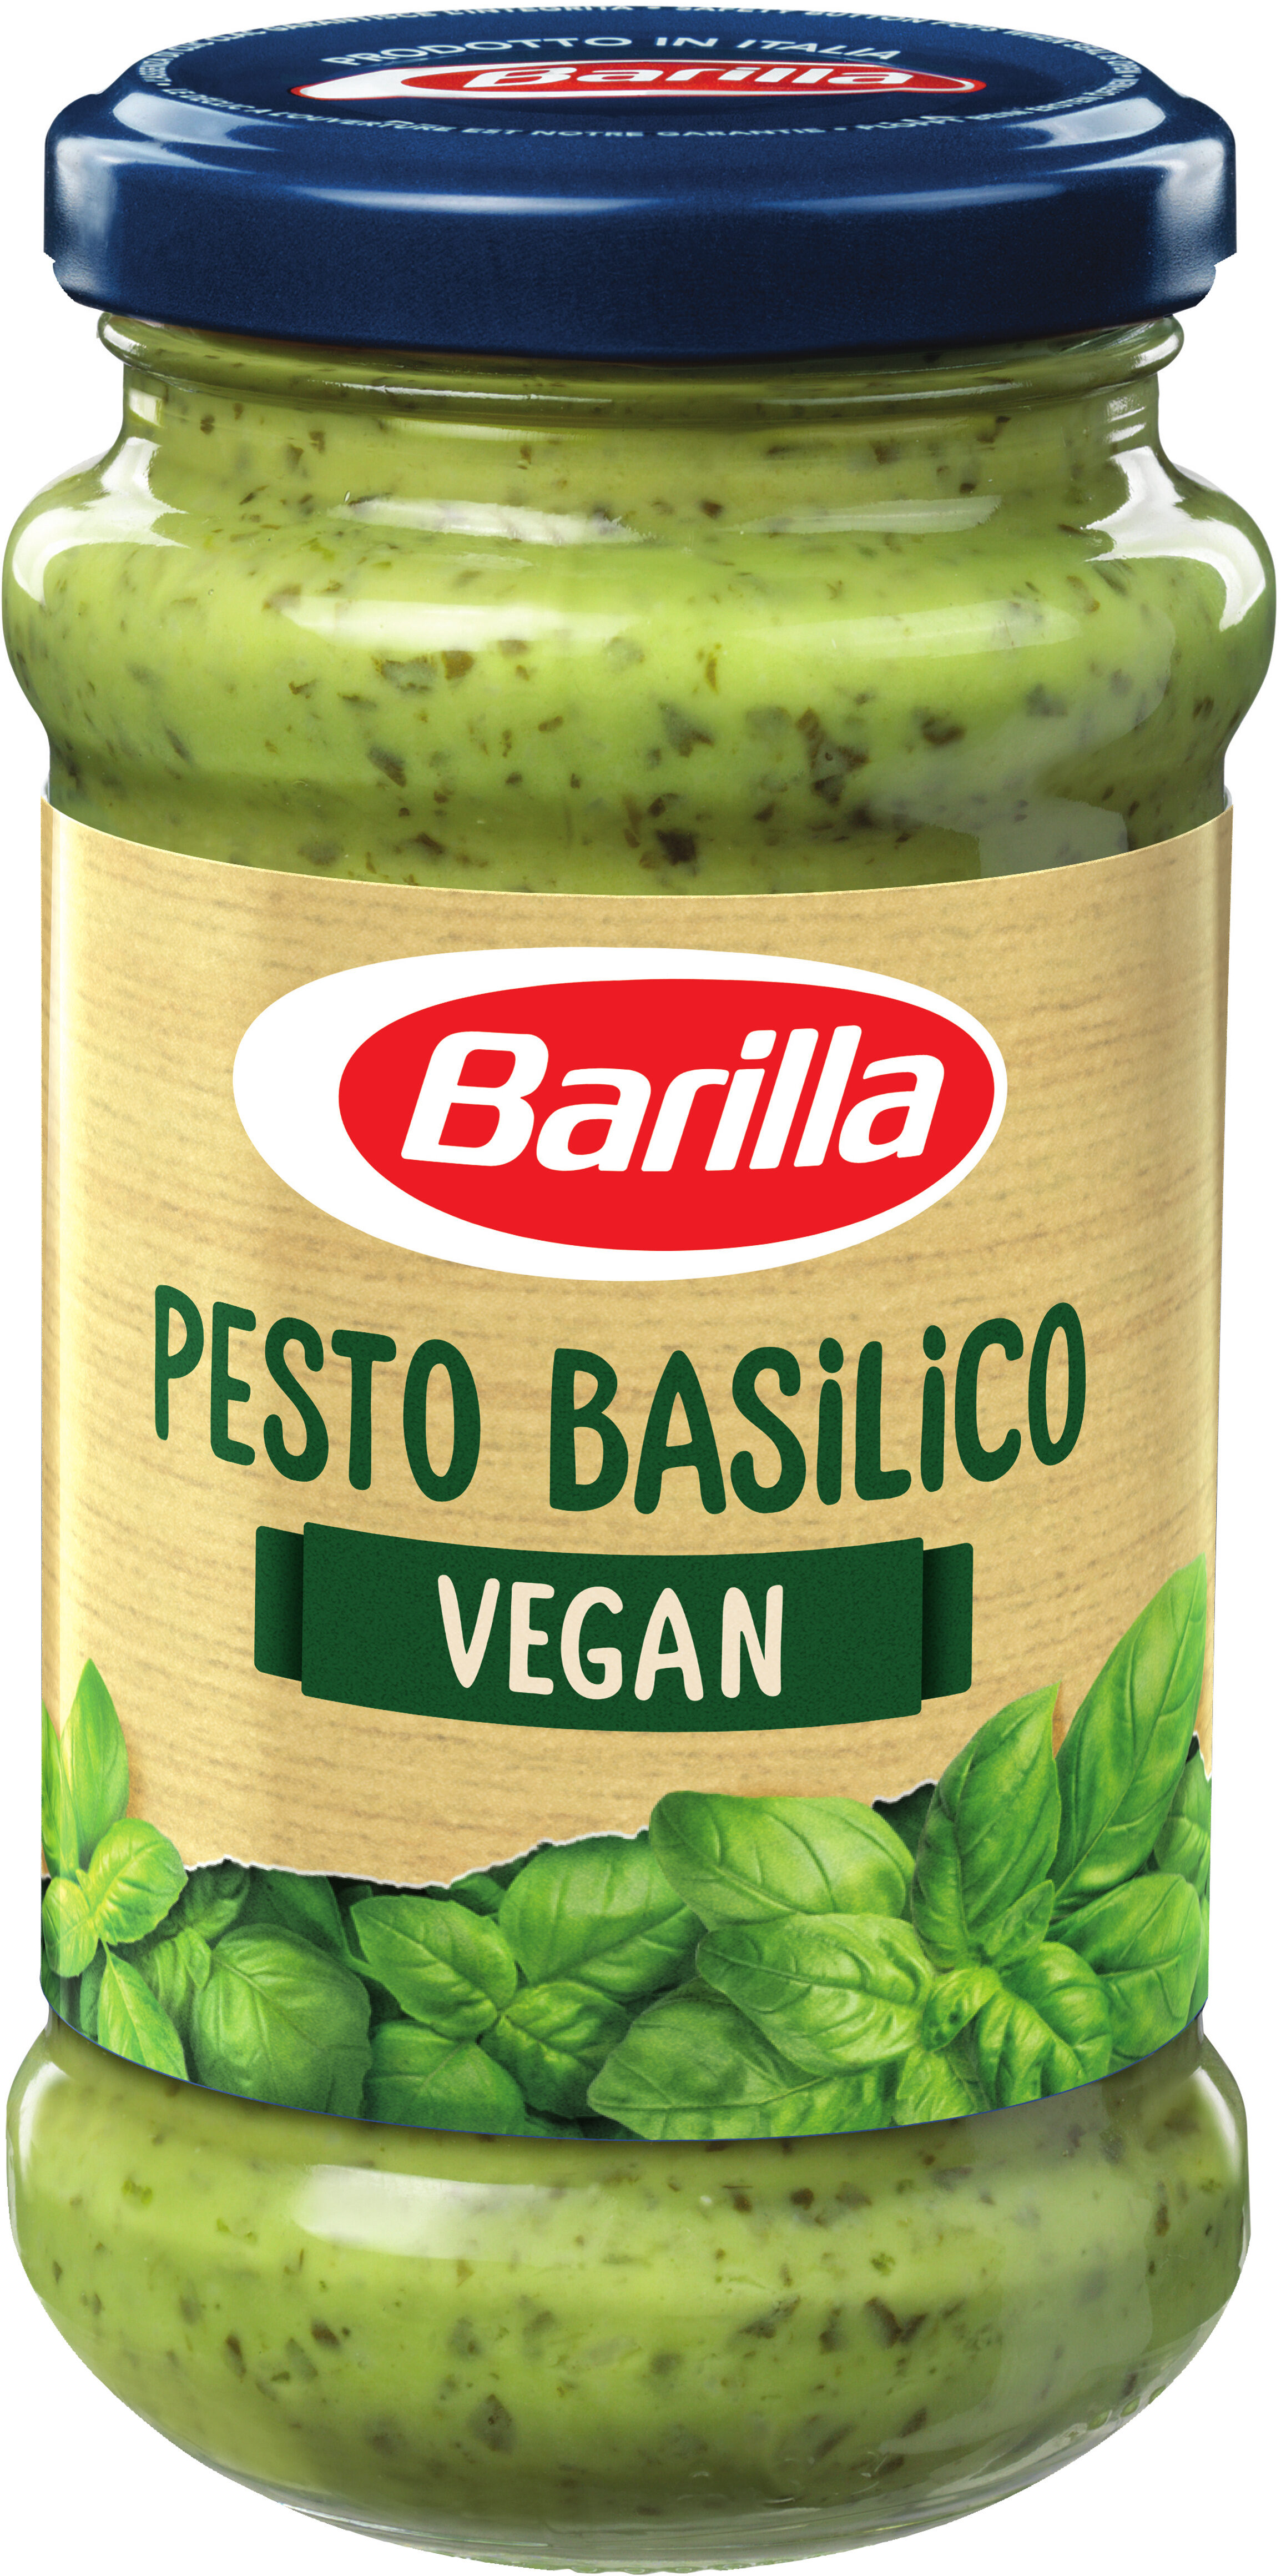 pesto au basilic vegan barilla 195 g. Black Bedroom Furniture Sets. Home Design Ideas